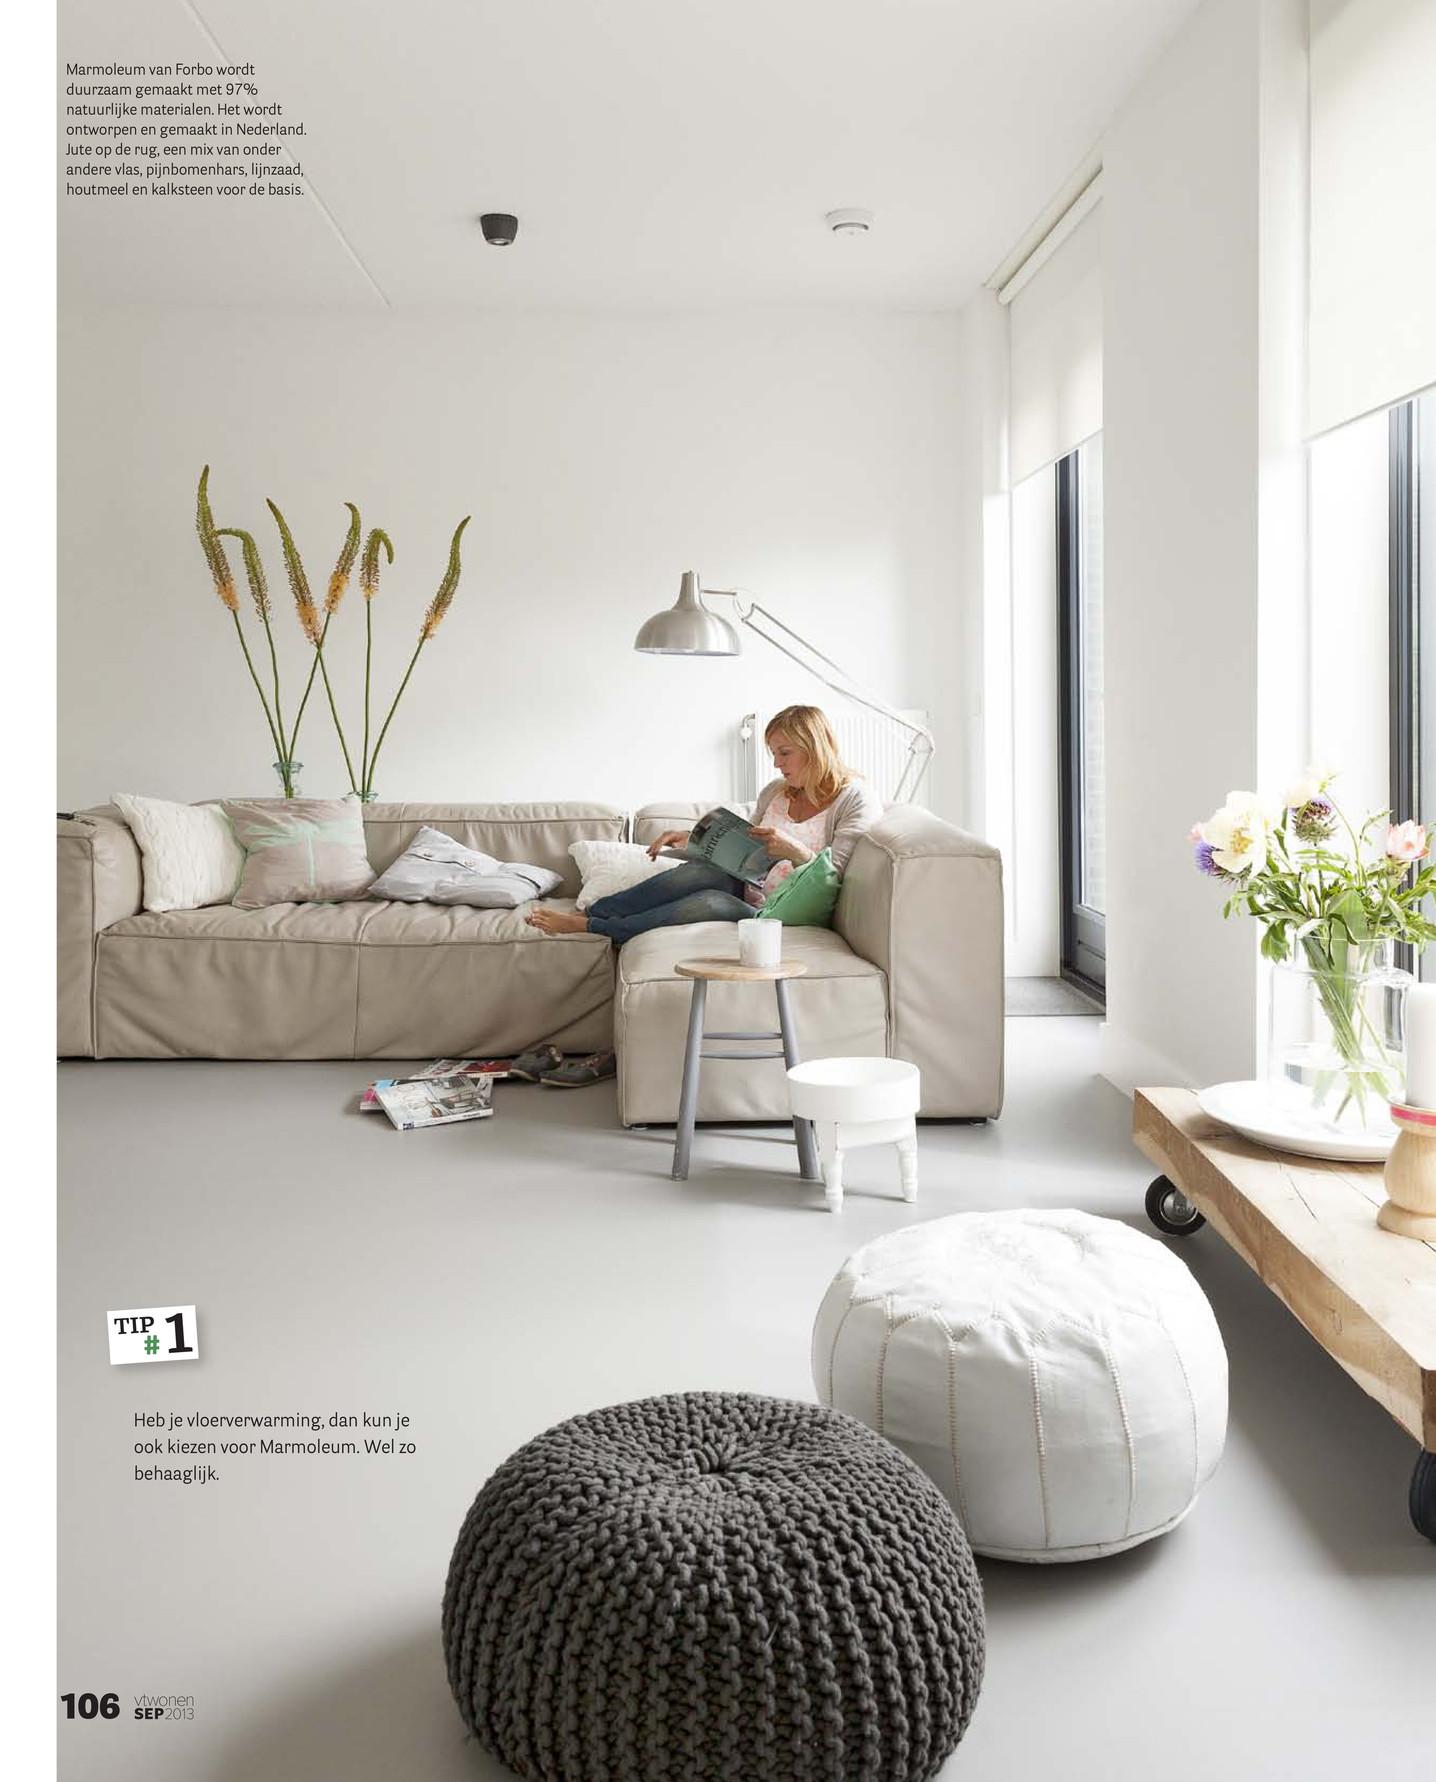 Forbo Flooring NL - VT wonen Woonwens 2013 - Pagina 2-3